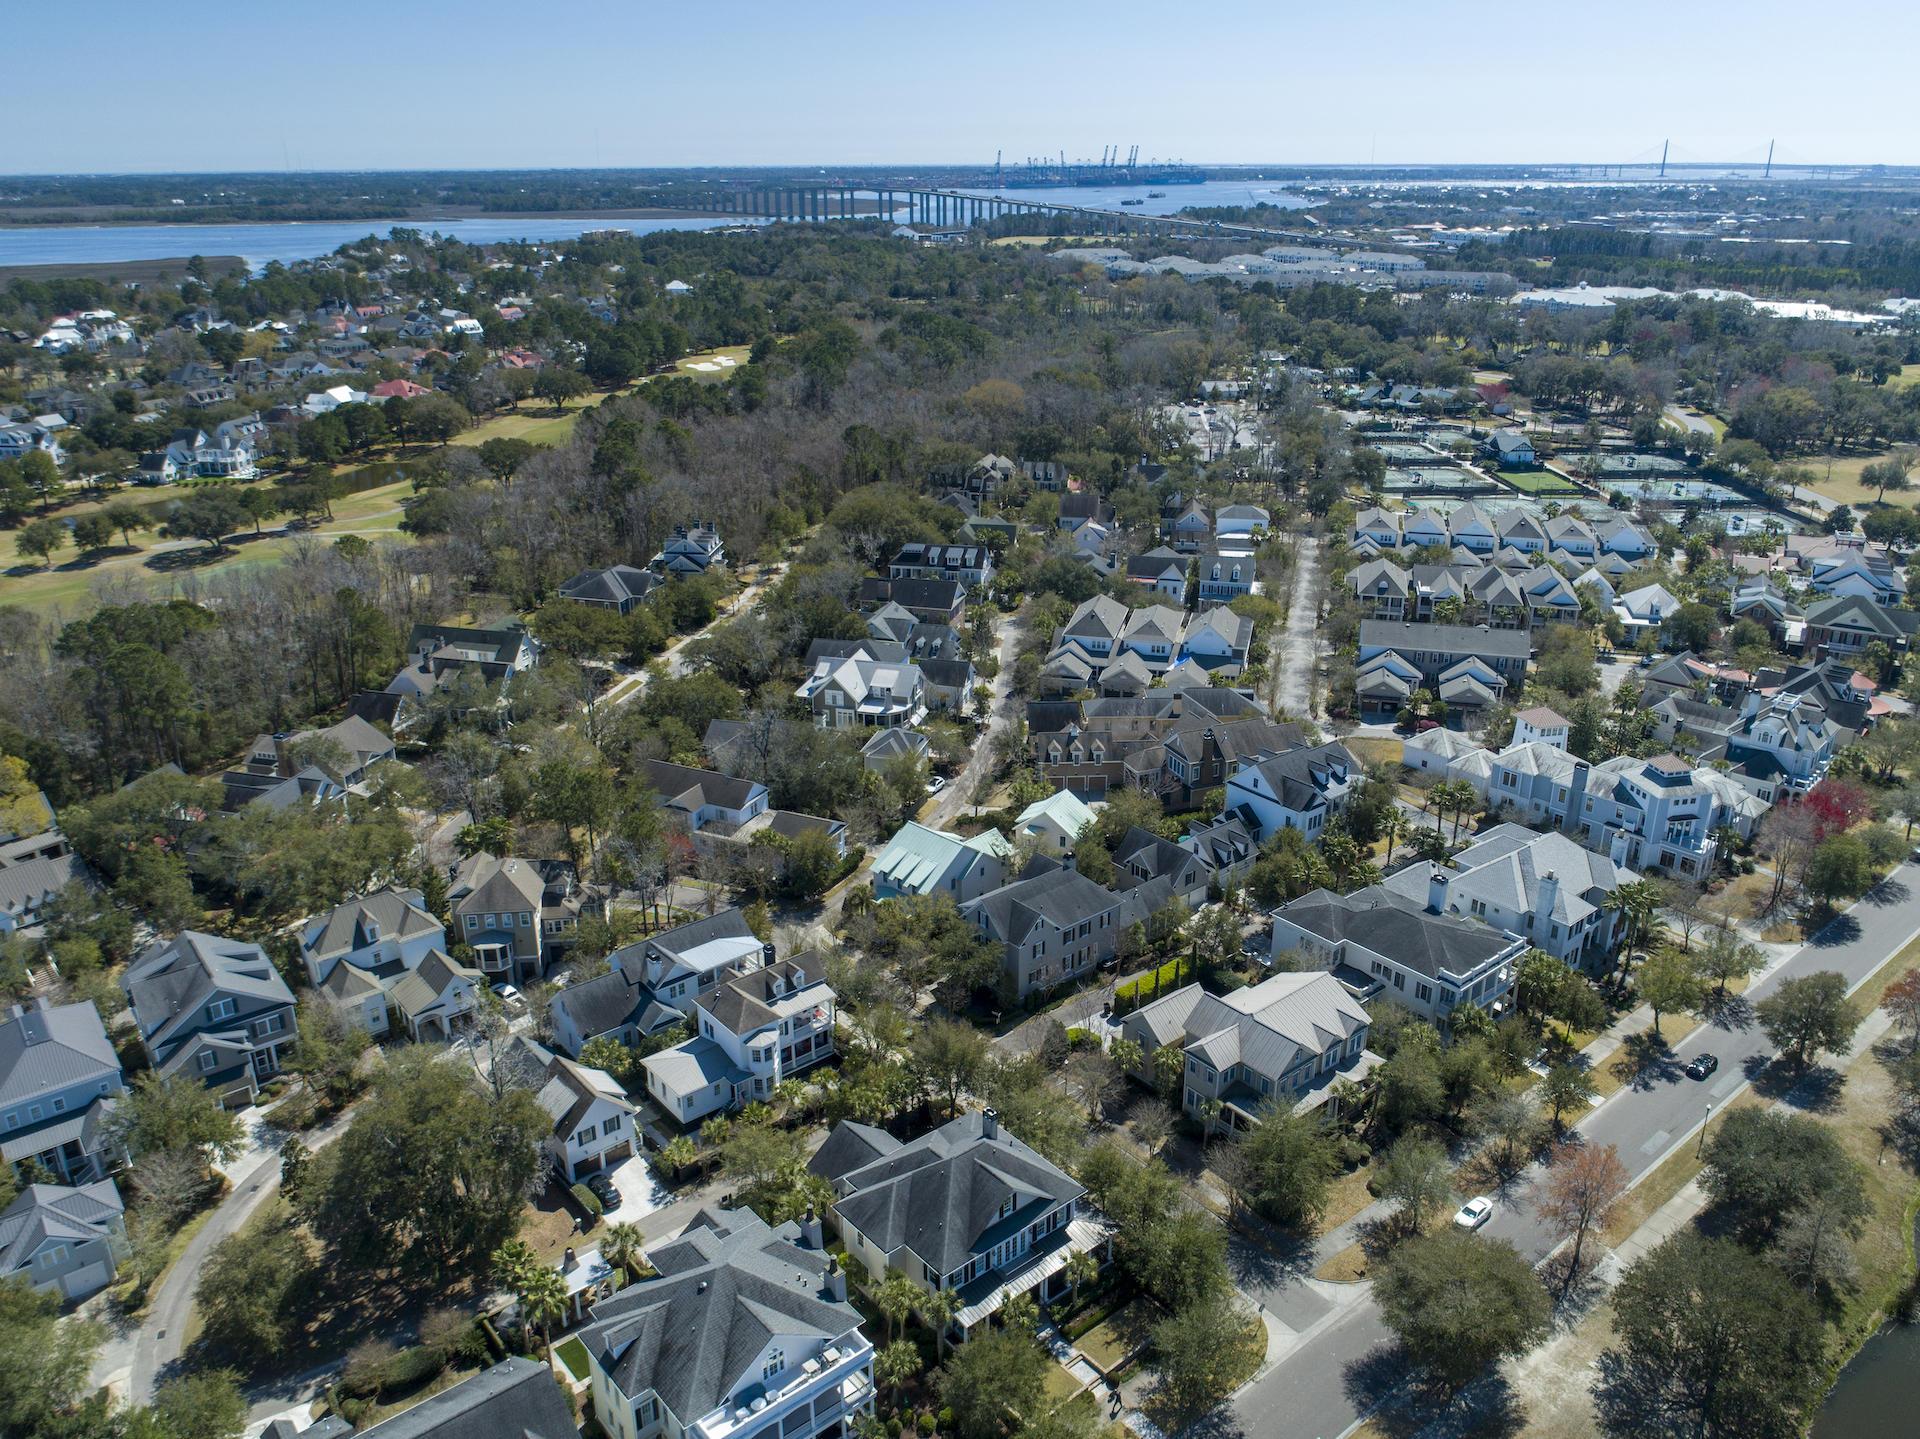 Daniel Island Homes For Sale - 623 Island Park, Charleston, SC - 0